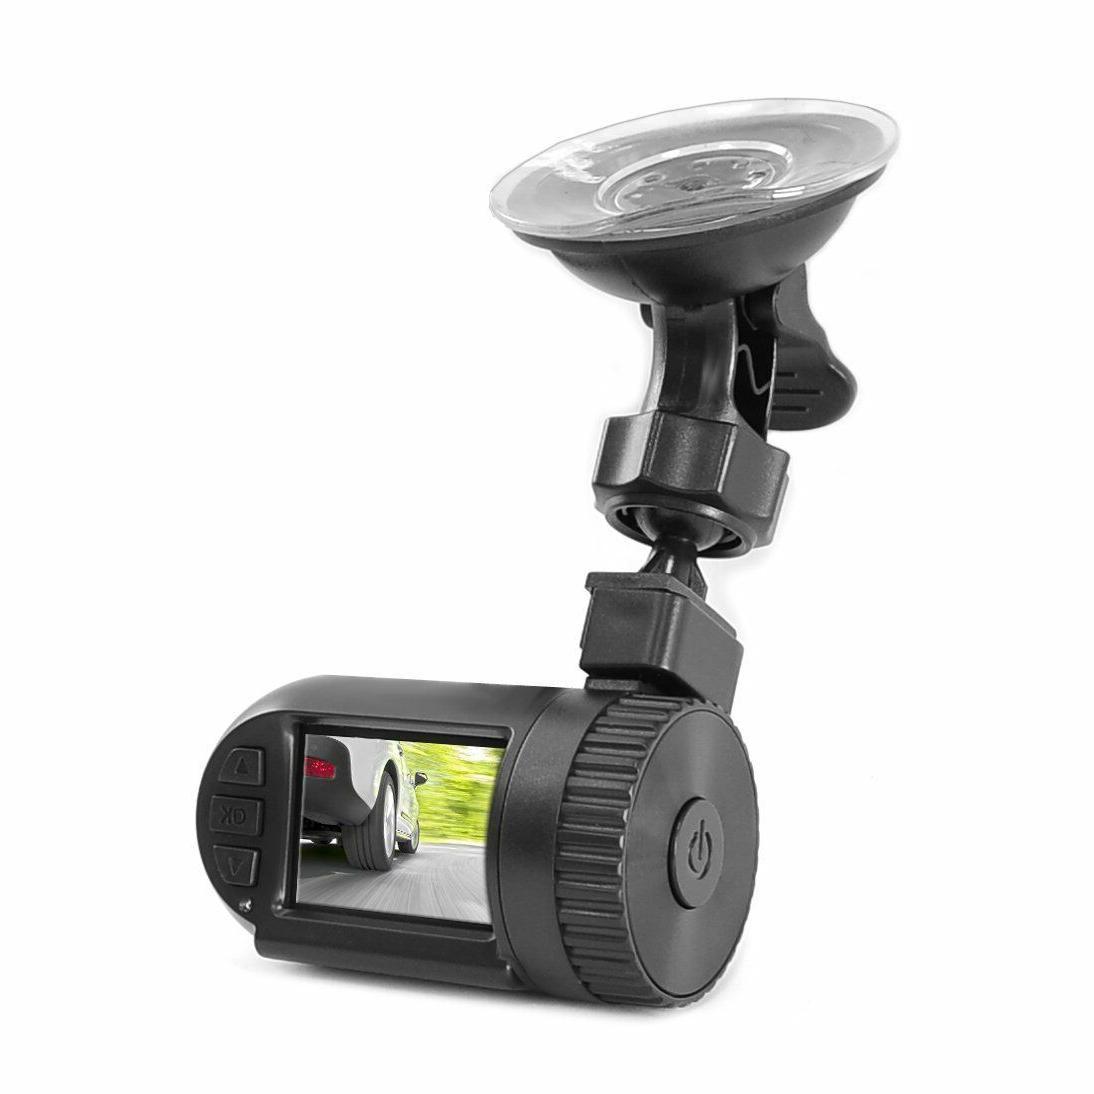 1080P COMPACT HD DASH CAM